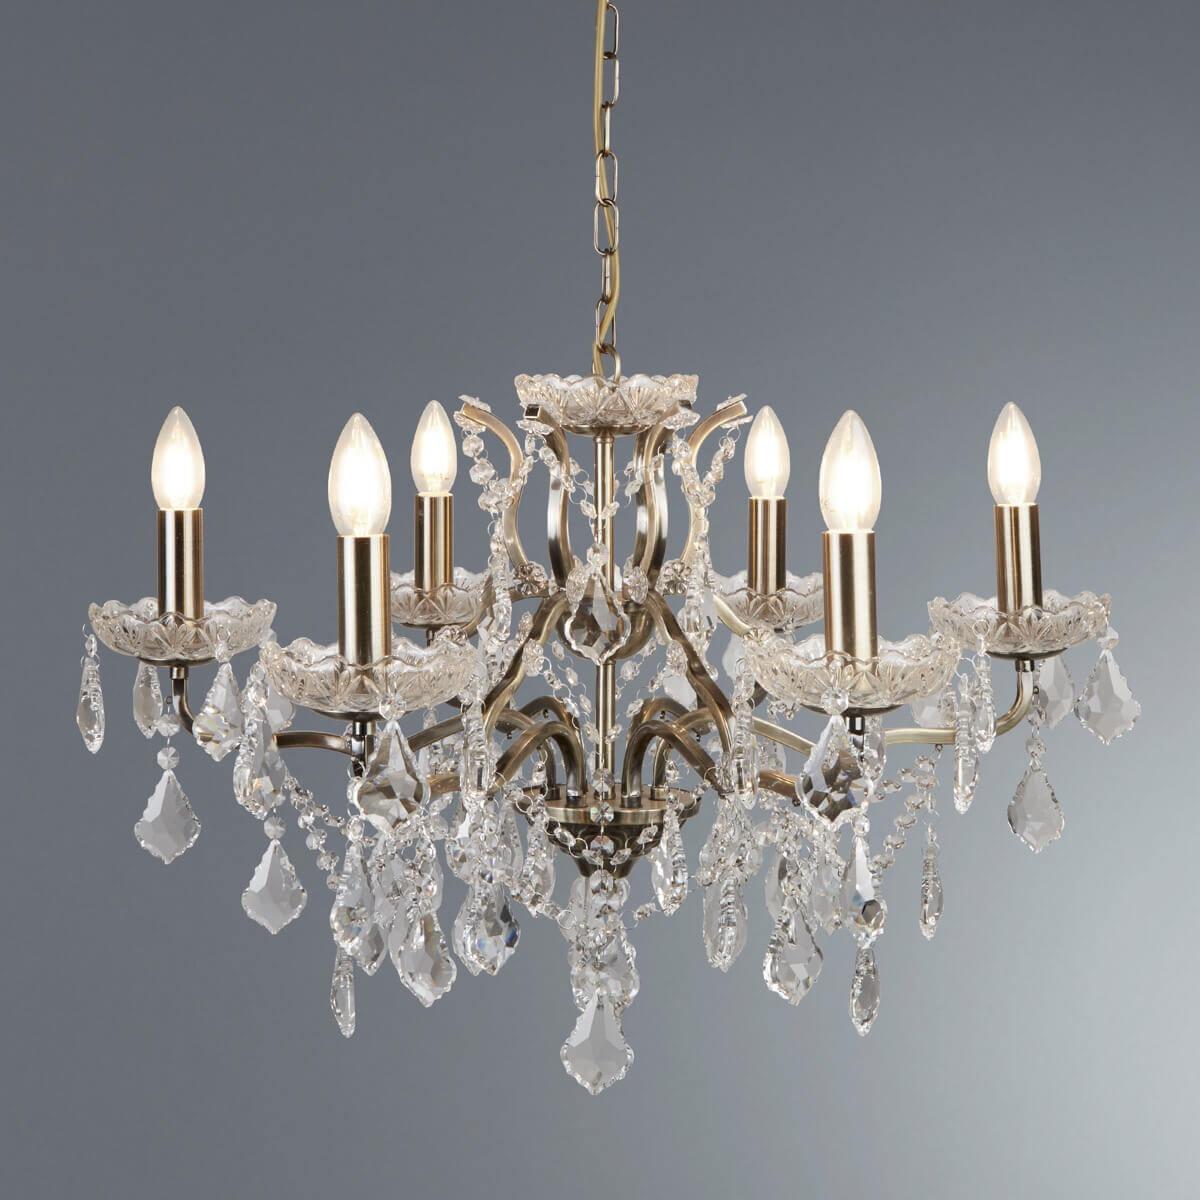 Paris 6 Light Chandelier Clear Crystal Drops Trim Antique Brass Ledlam Lighting